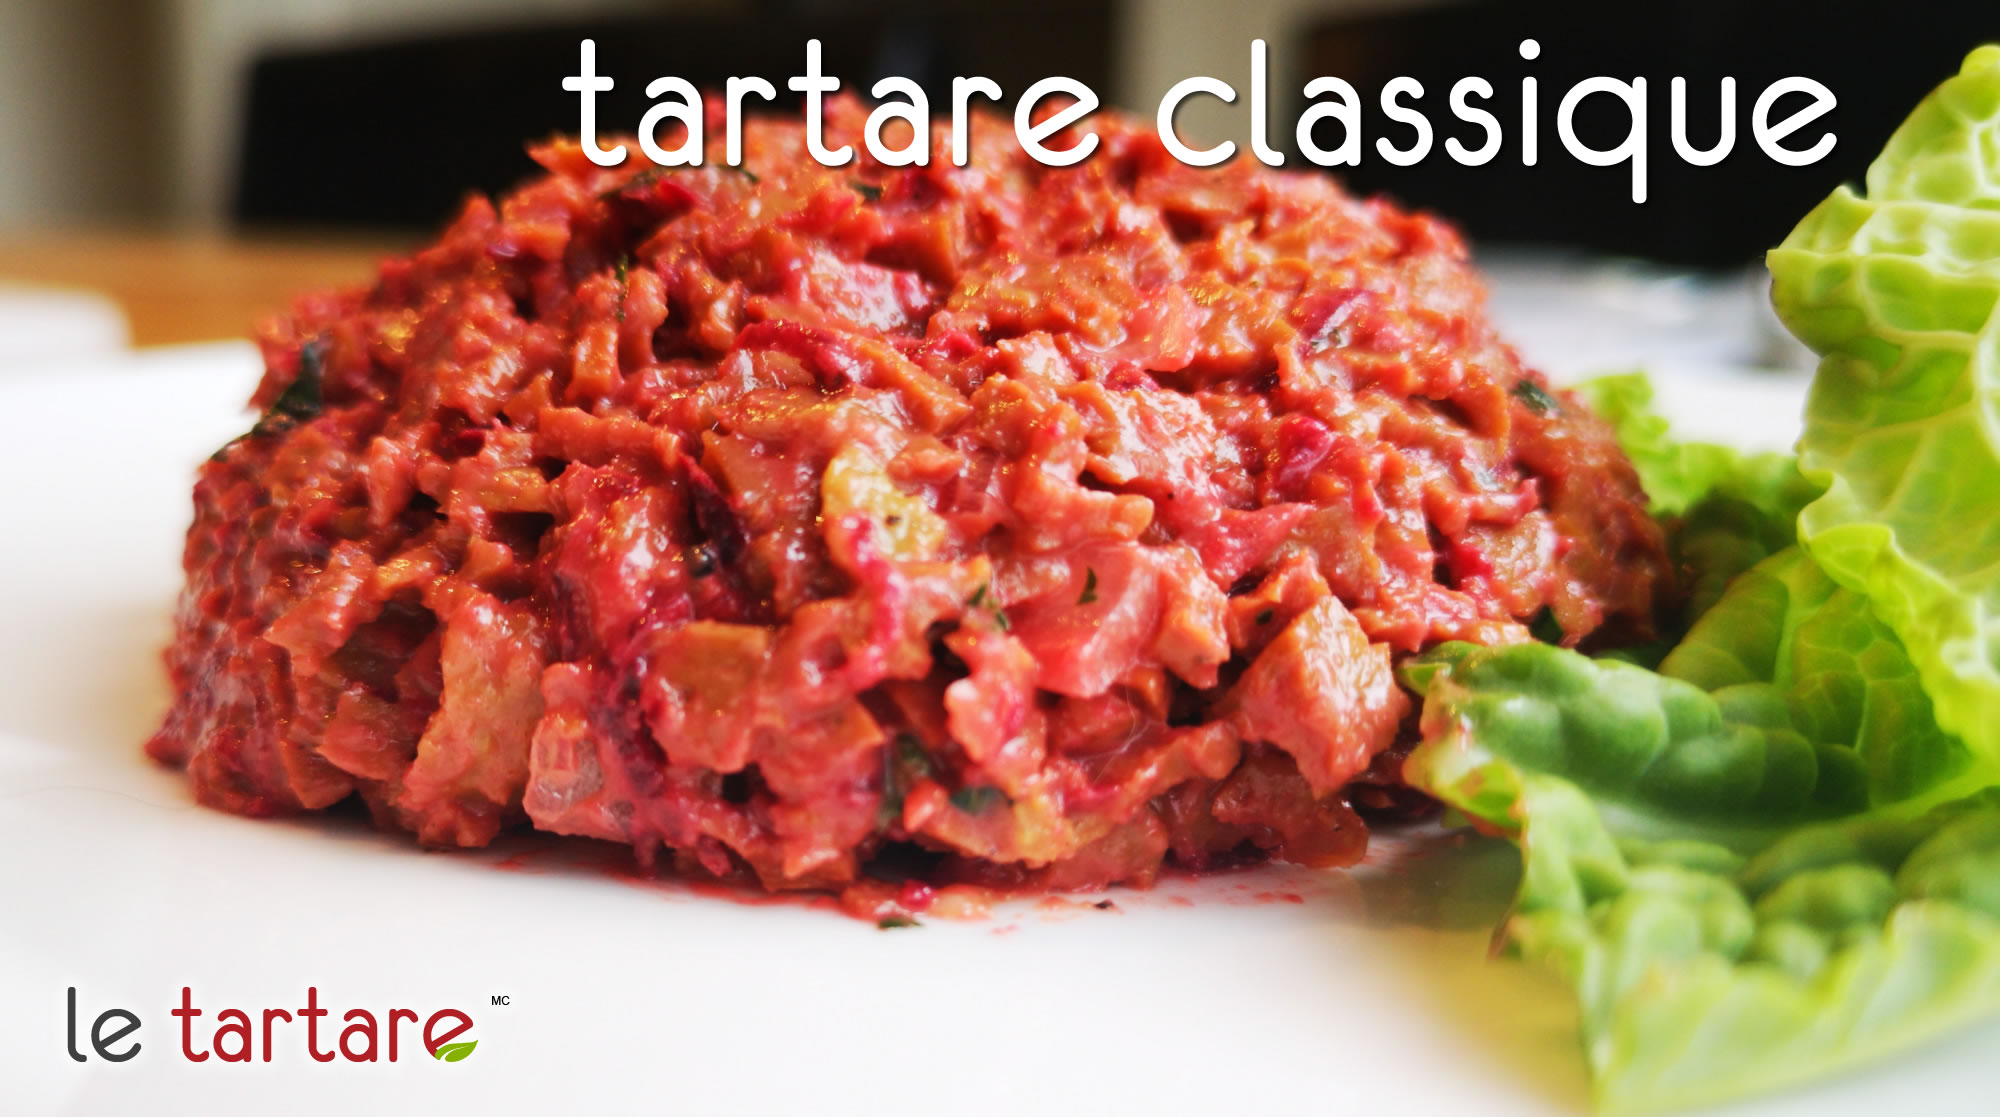 tartare classique - Les produits